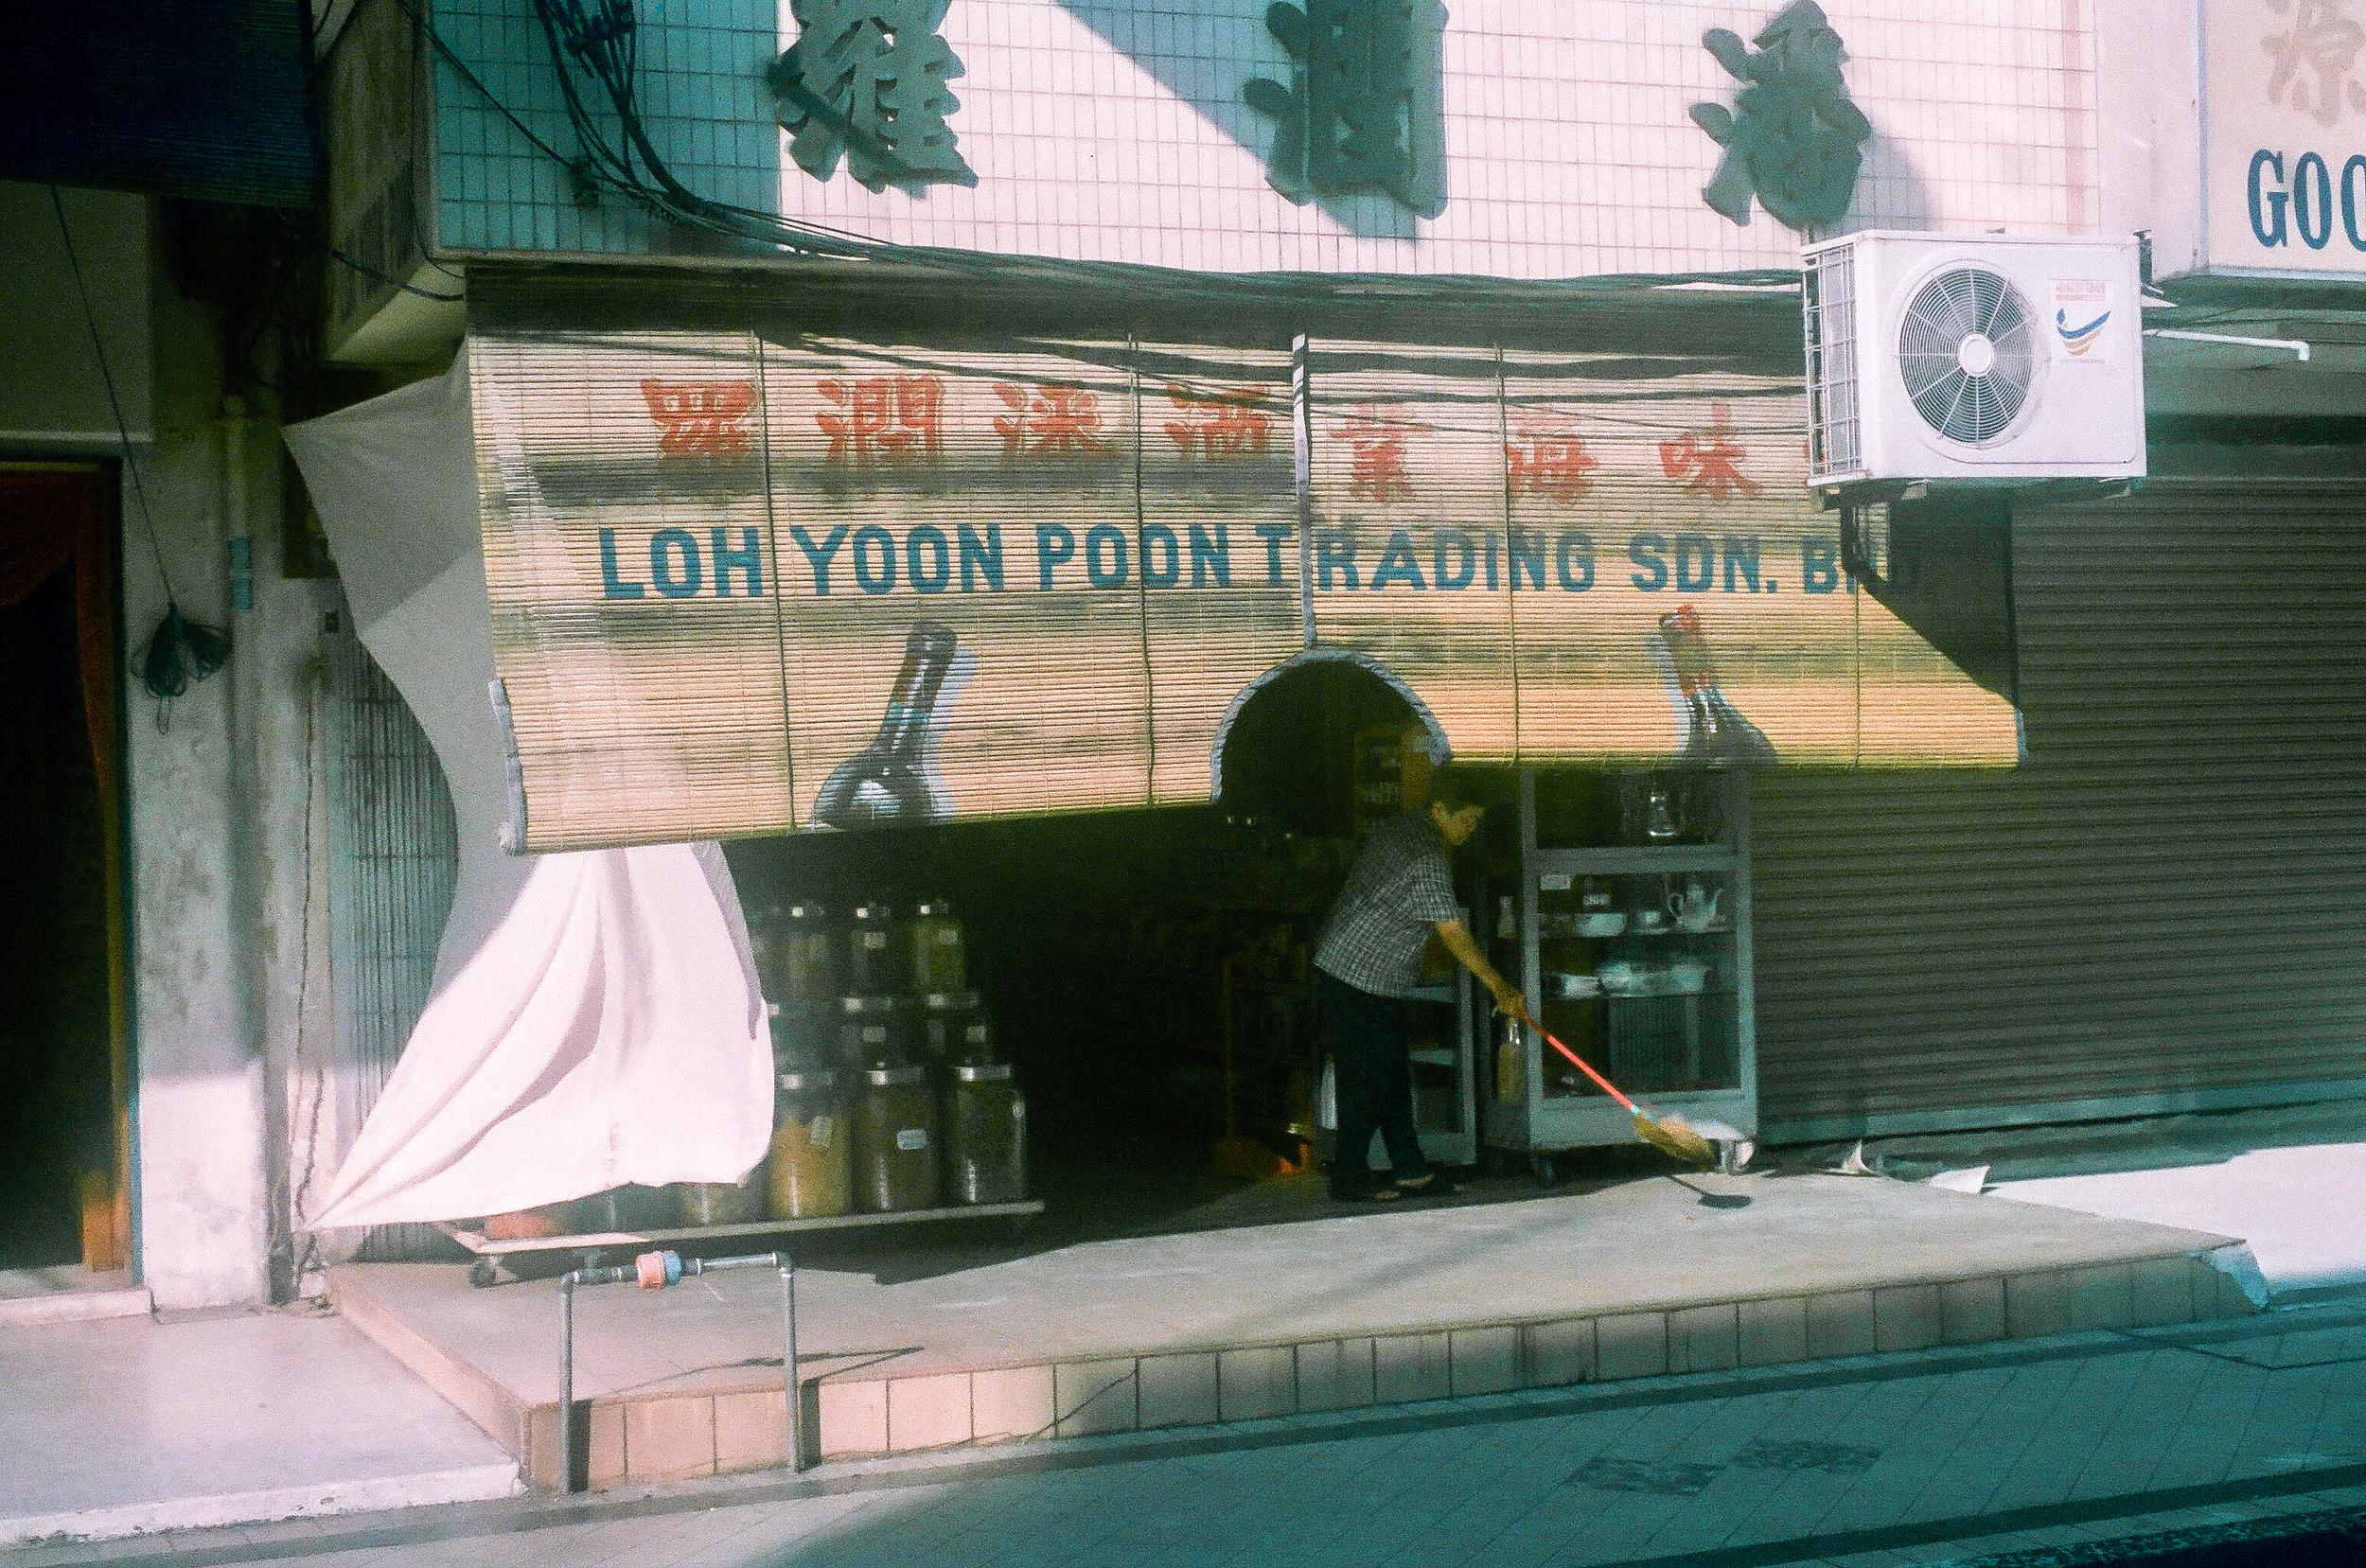 Asia Film LOH YOON POON TRADING.jpg